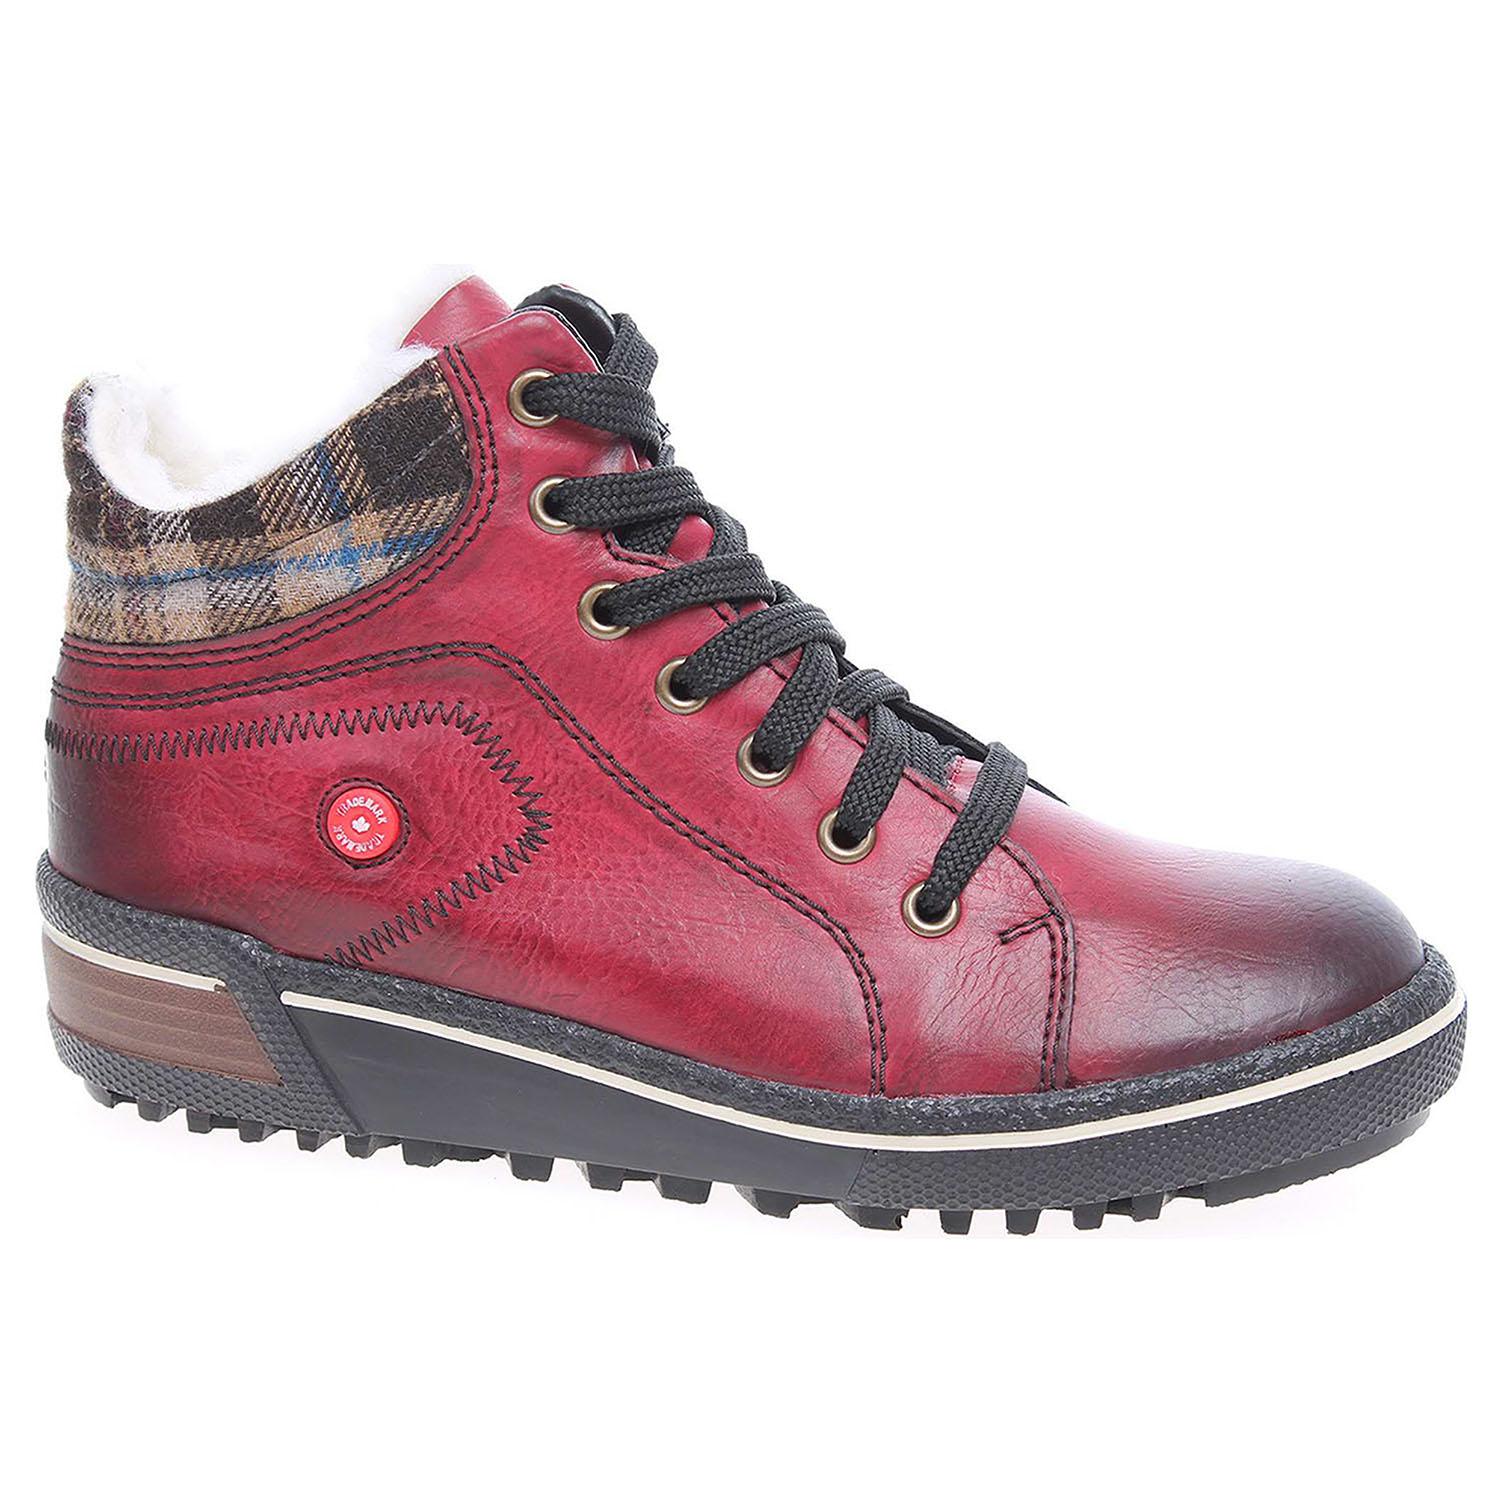 aeb5434e5f Ecco Dámská kotníková obuv Rieker Z6423-35 rot kombi 22400569